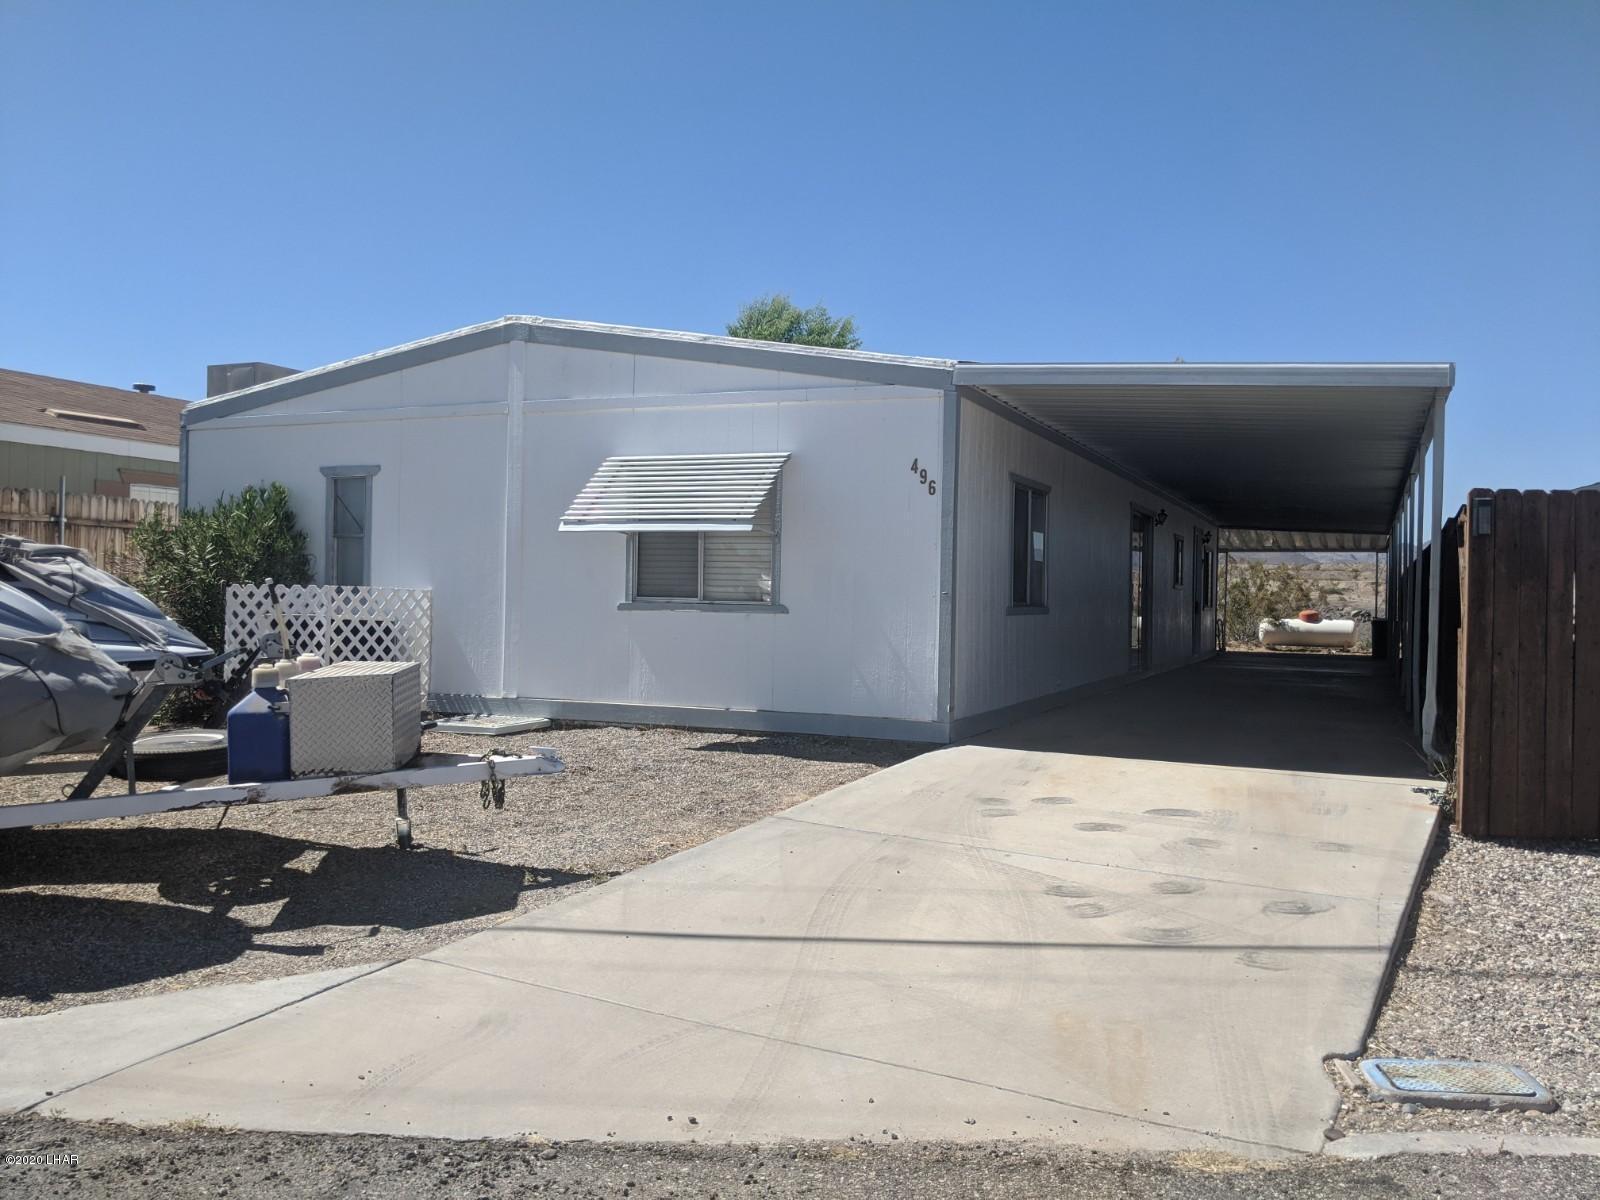 Details for 496 Bluewater, Parker, AZ 85344